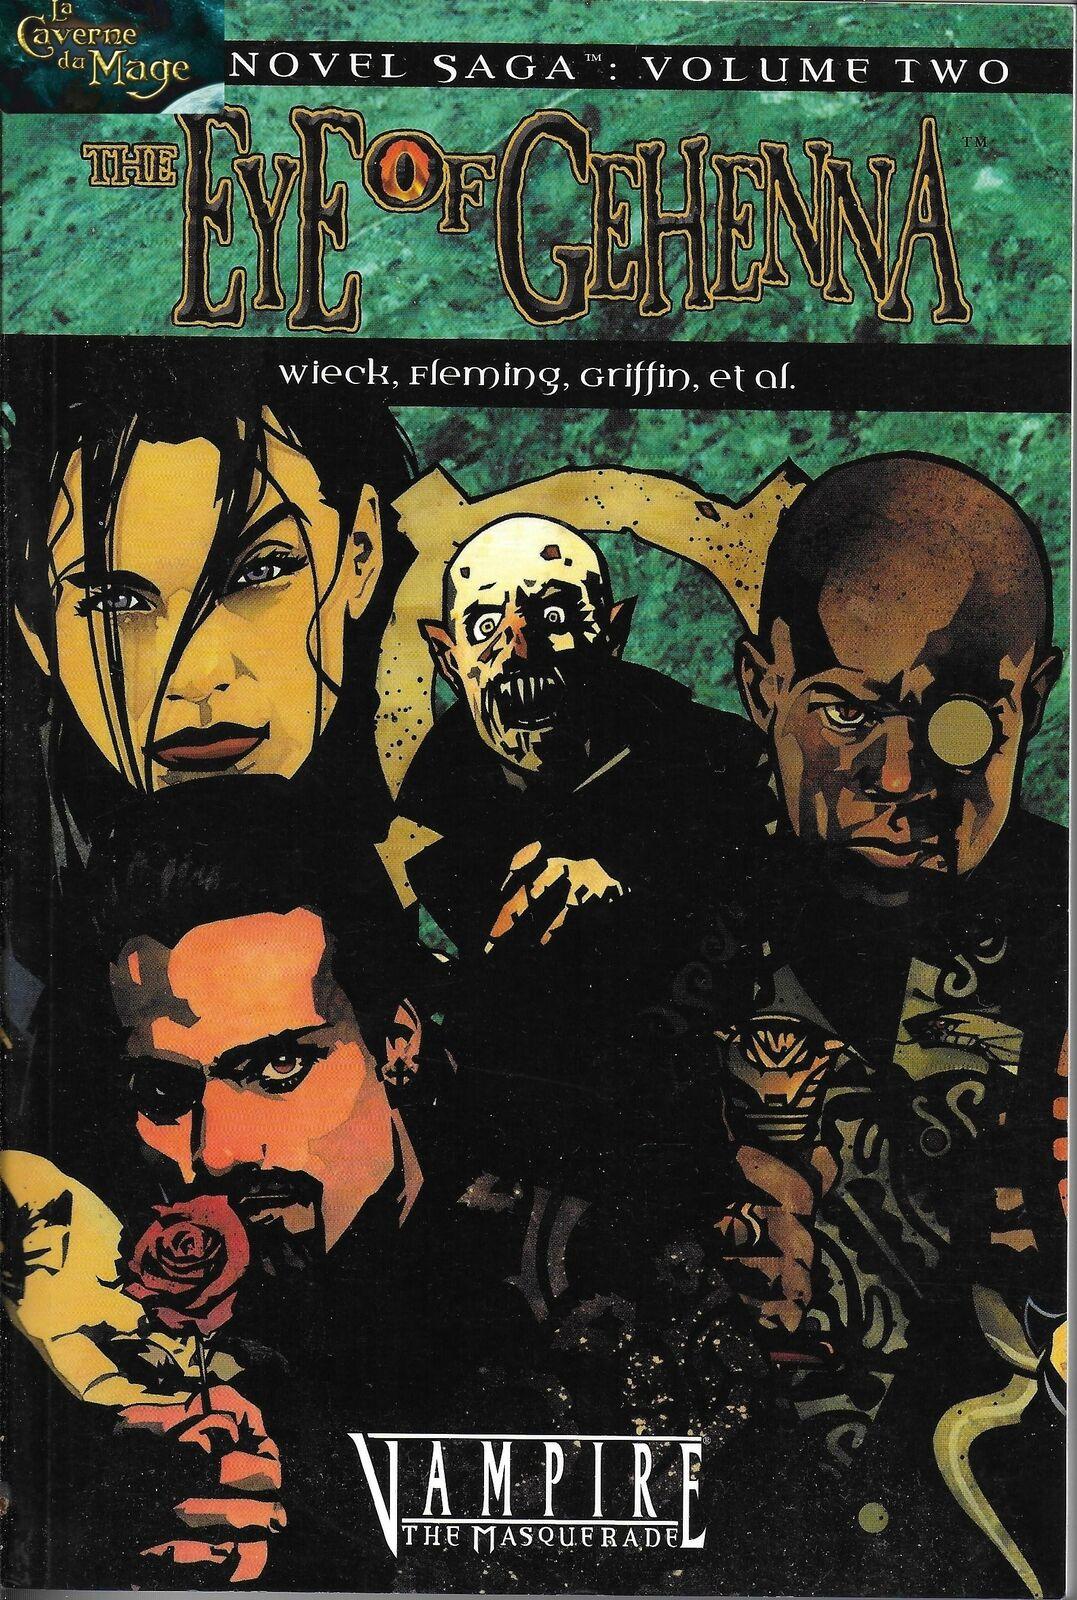 VAMPIRE THE MASQUERADE - The Eye of Gehenna RPG